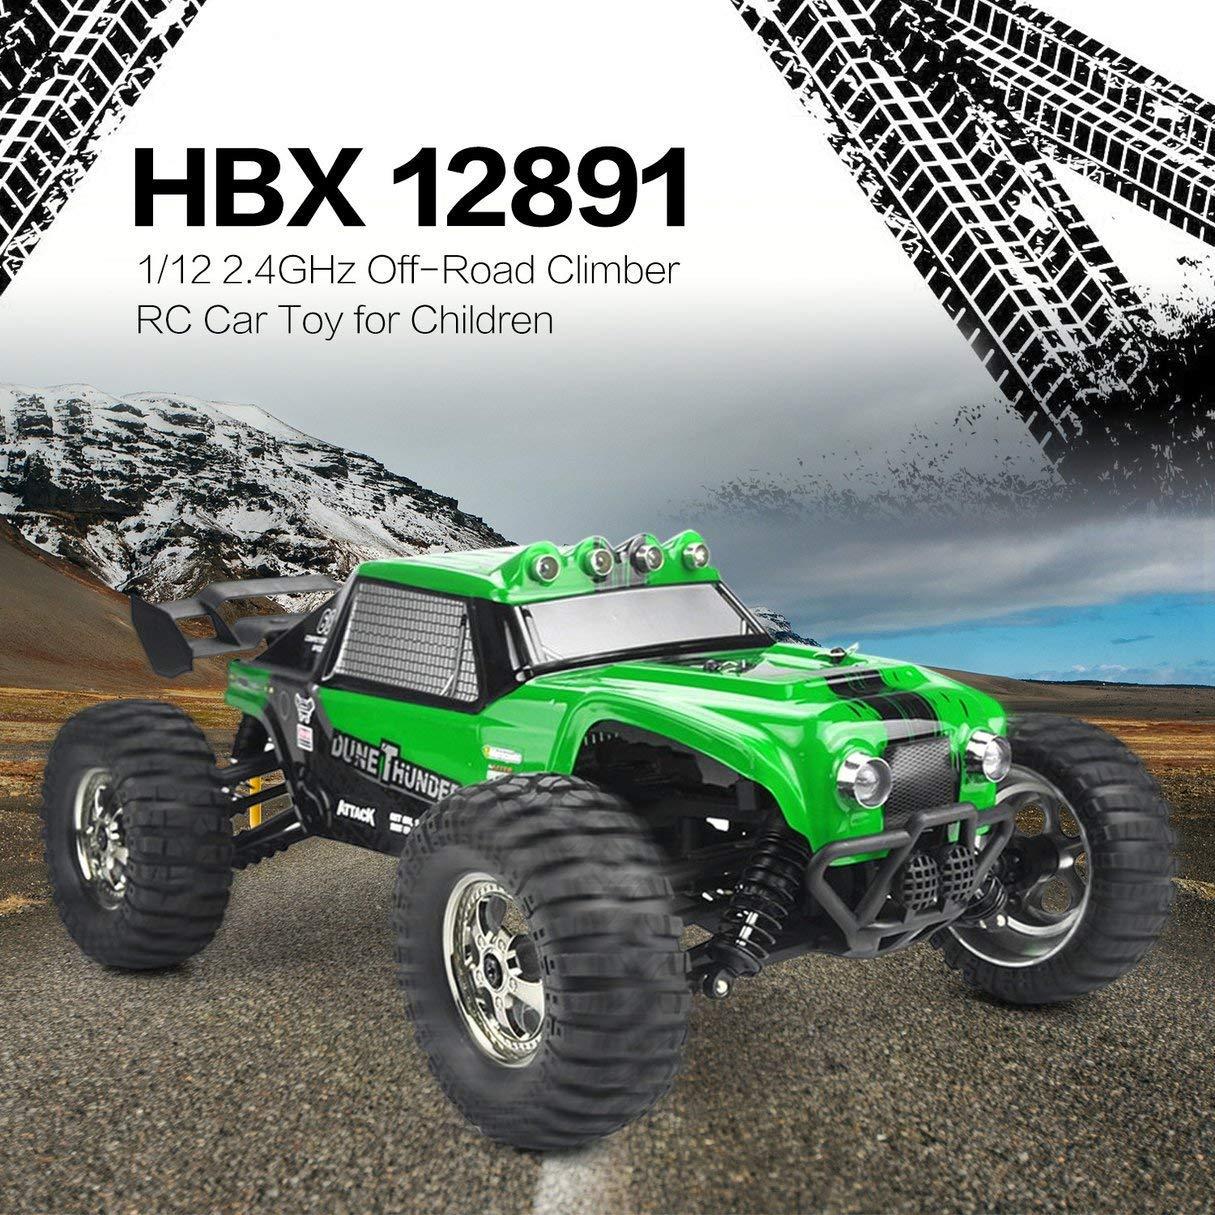 2X Pack Bater/ías Incluidas Velocidad 40km//h Pi/ñones Metal con rodamientos Coche Radio Control MODELTRONIC Coche RC Rally 4x4 Desert Crawler 1//12 Dune Thunder HBX 12891 en 2.4G Resistente Agua